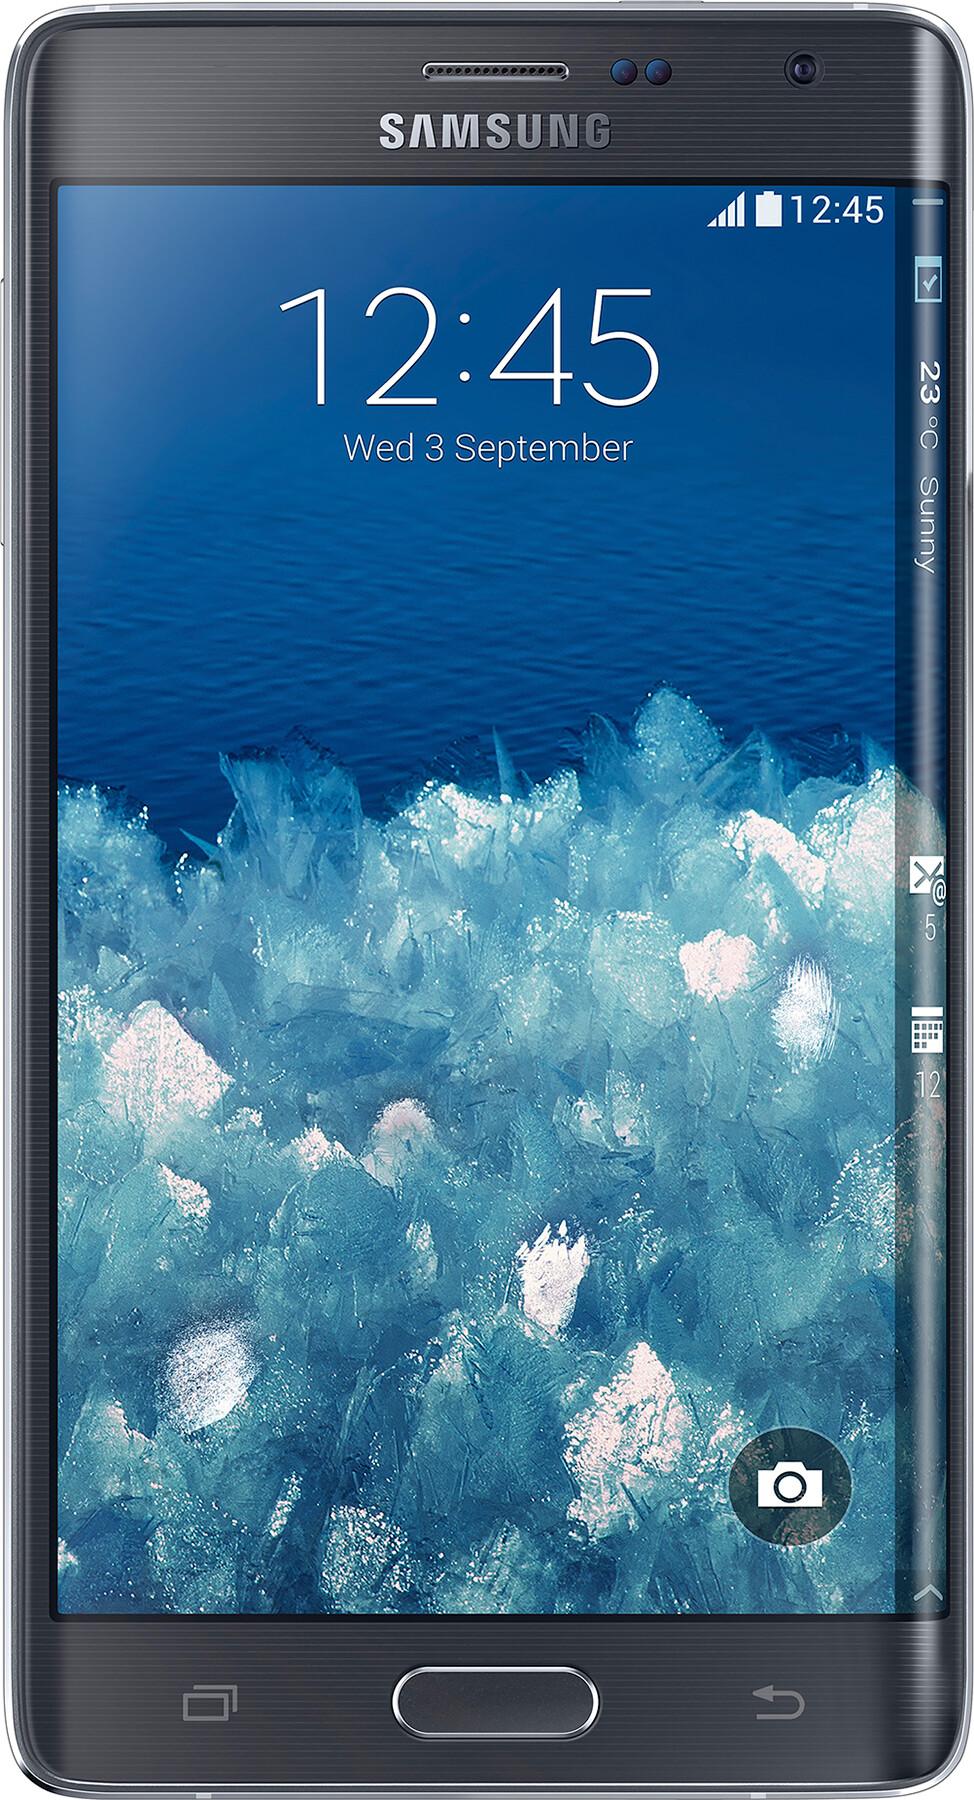 Apple iPhone 6 Plus vs Samsung Galaxy Note 4 vs Samsung Galaxy ...